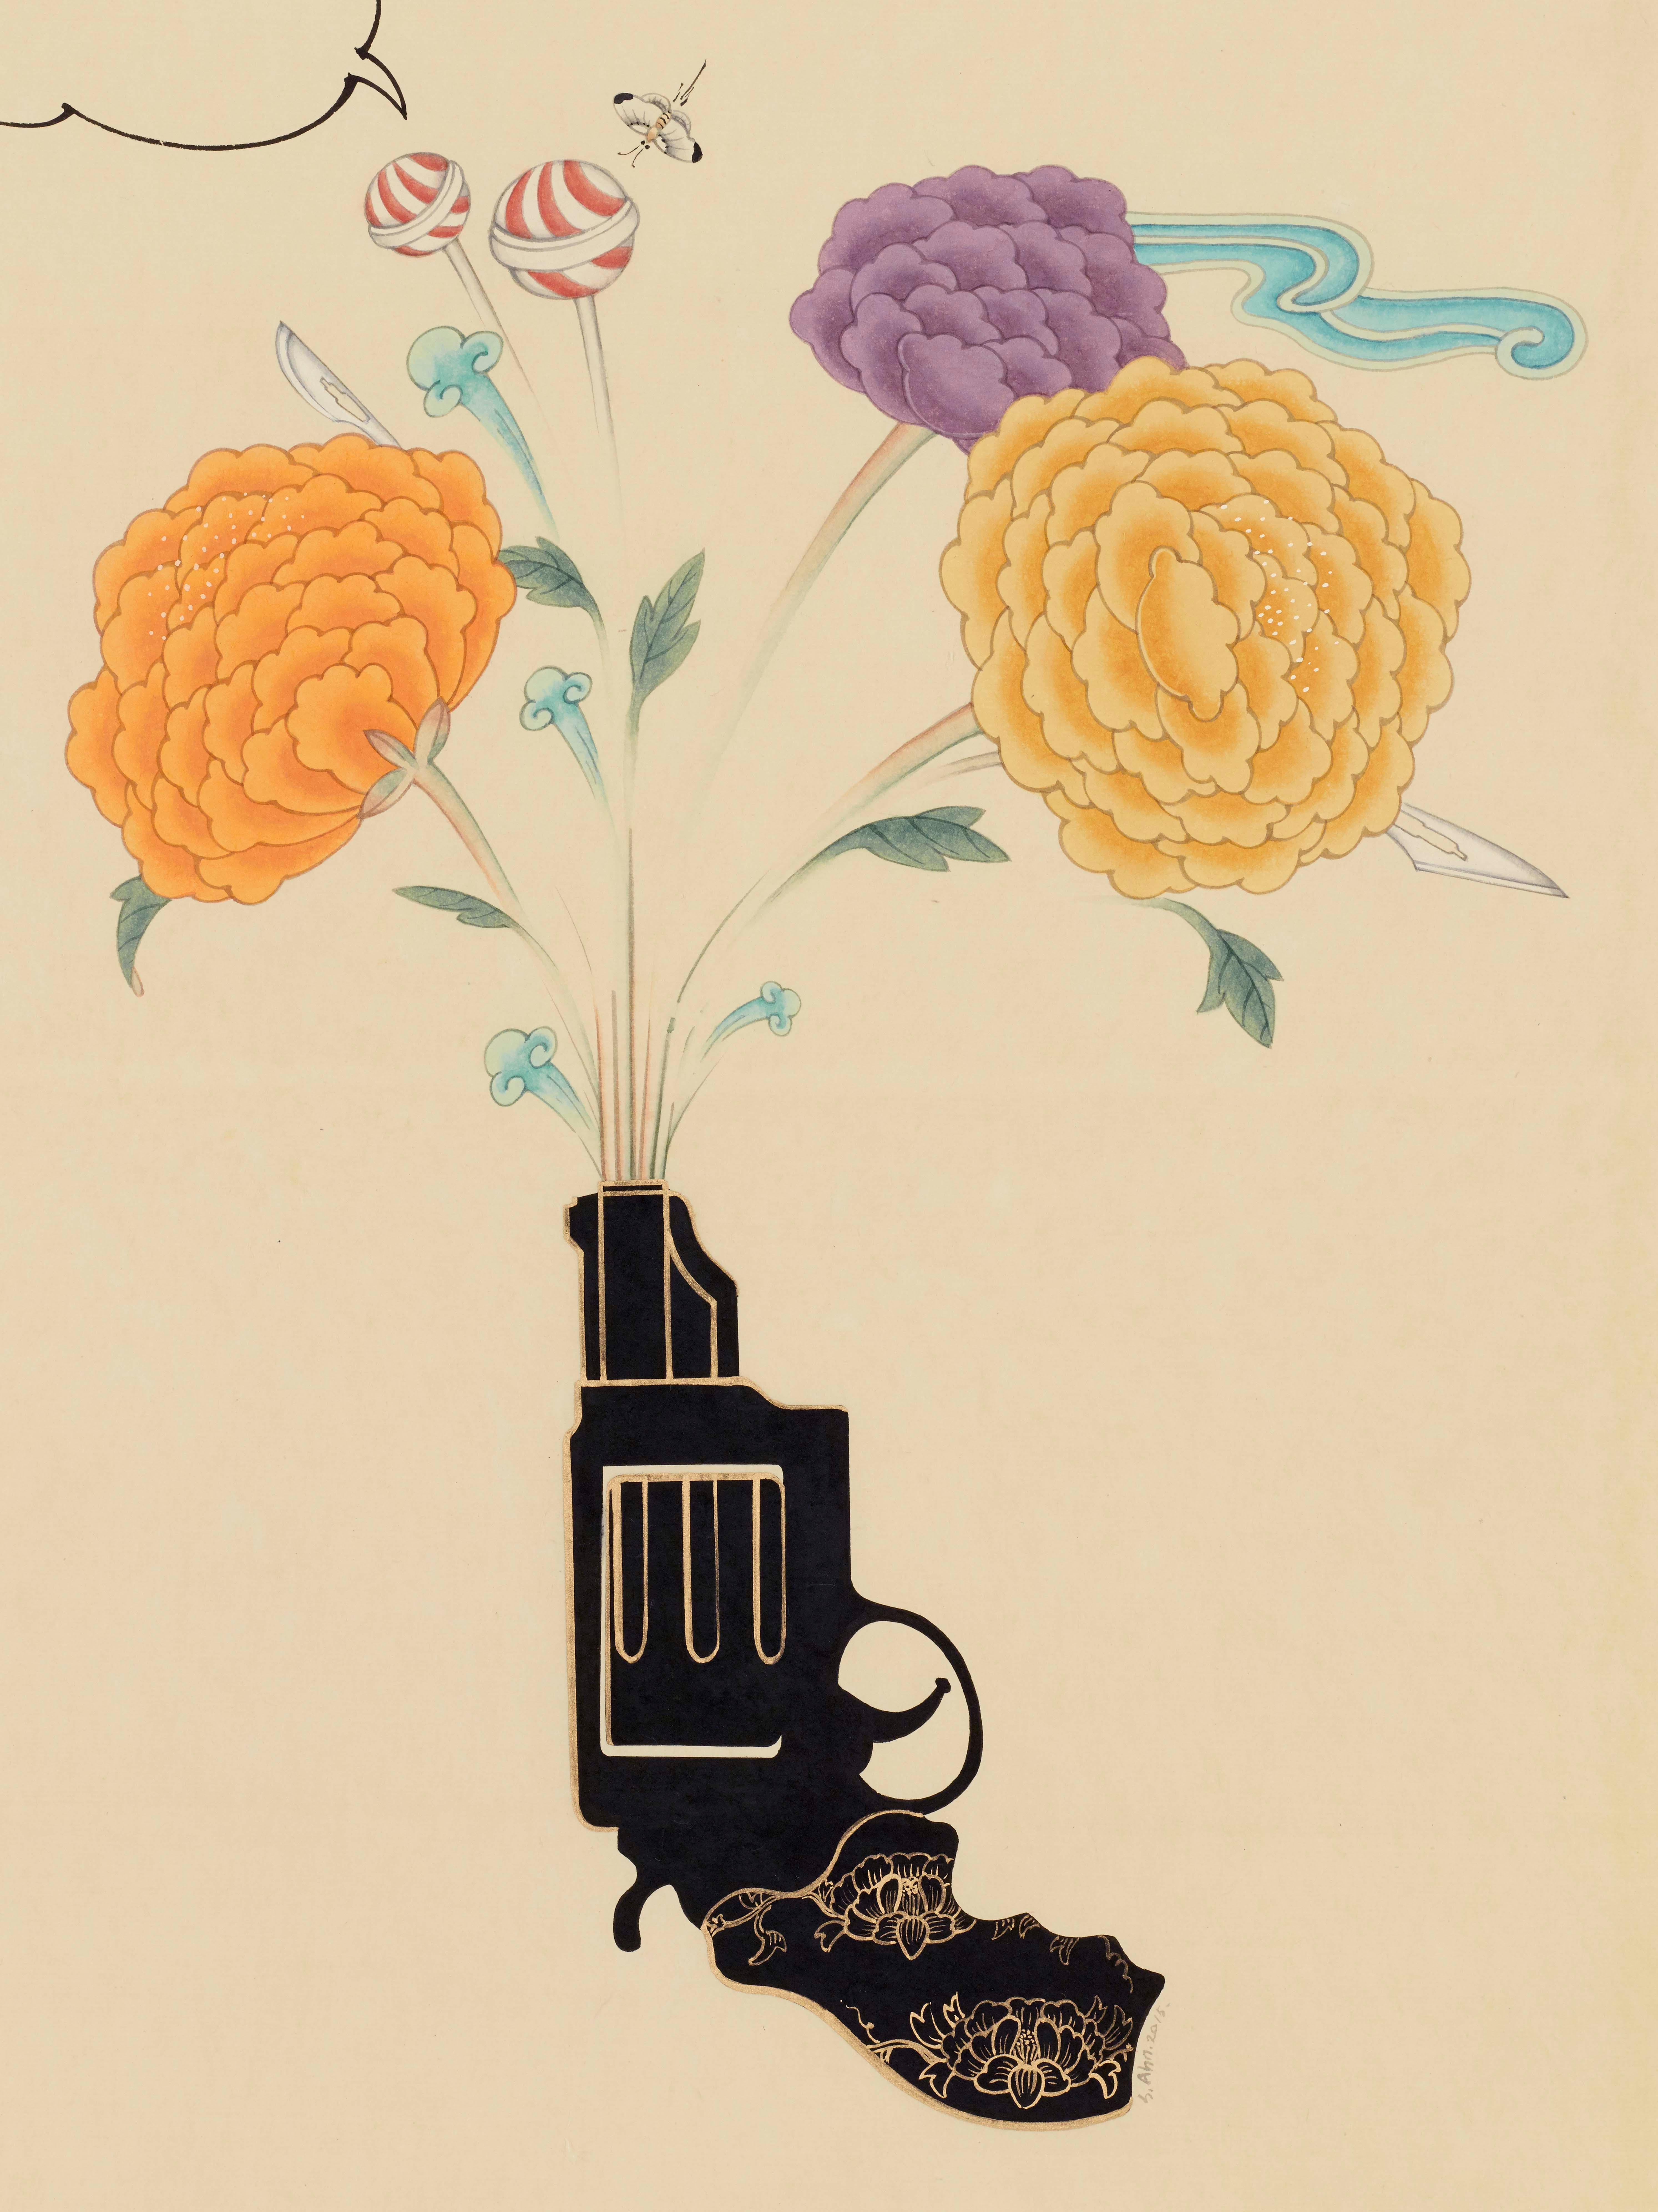 Inter-Relation Selfie 204, representational work on paper, gun with flowers